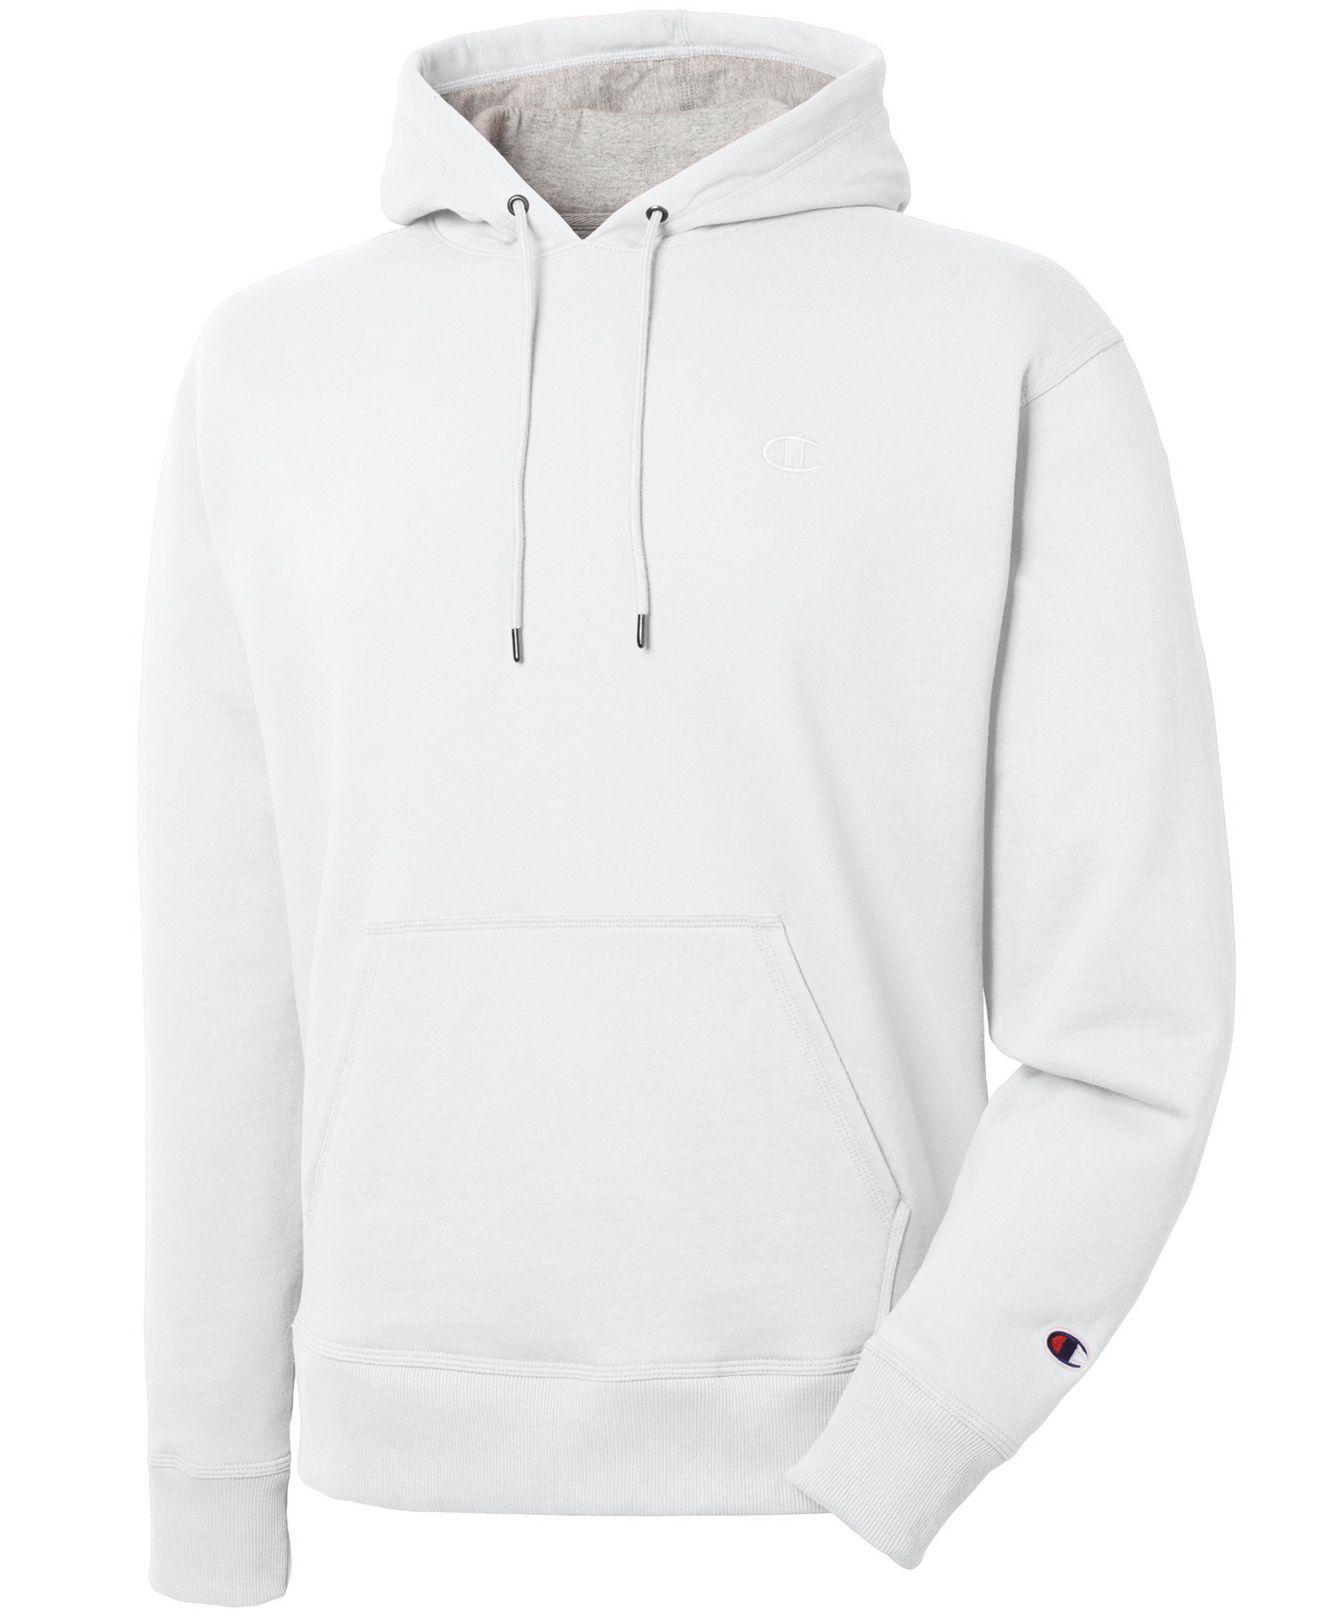 688e7420d8cd Lyst - Champion Men s Powerblend Fleece Hoodie in White for Men